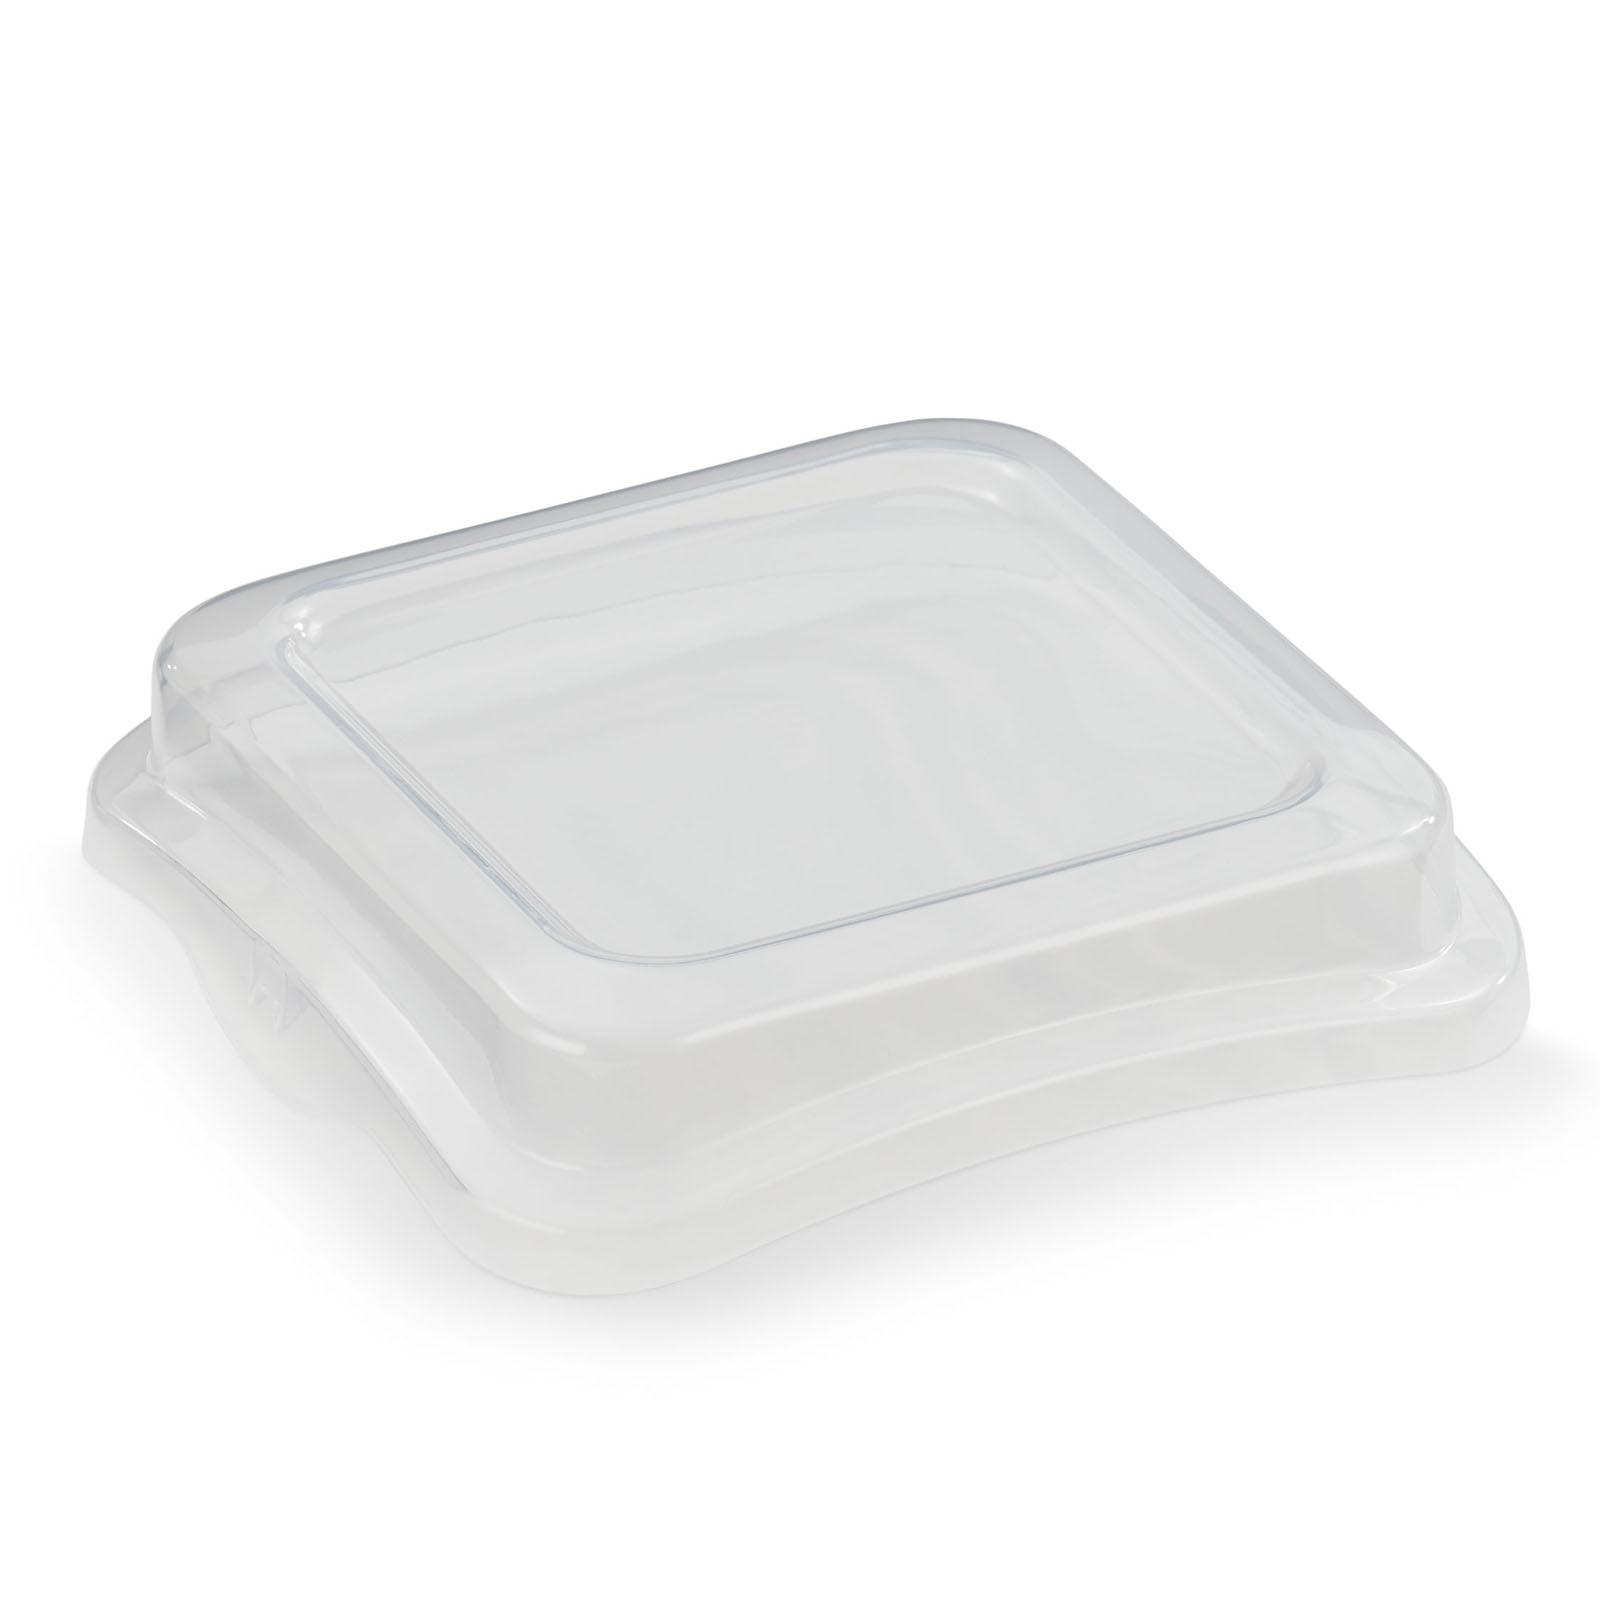 Vollrath 40030 food pan cover, plastic